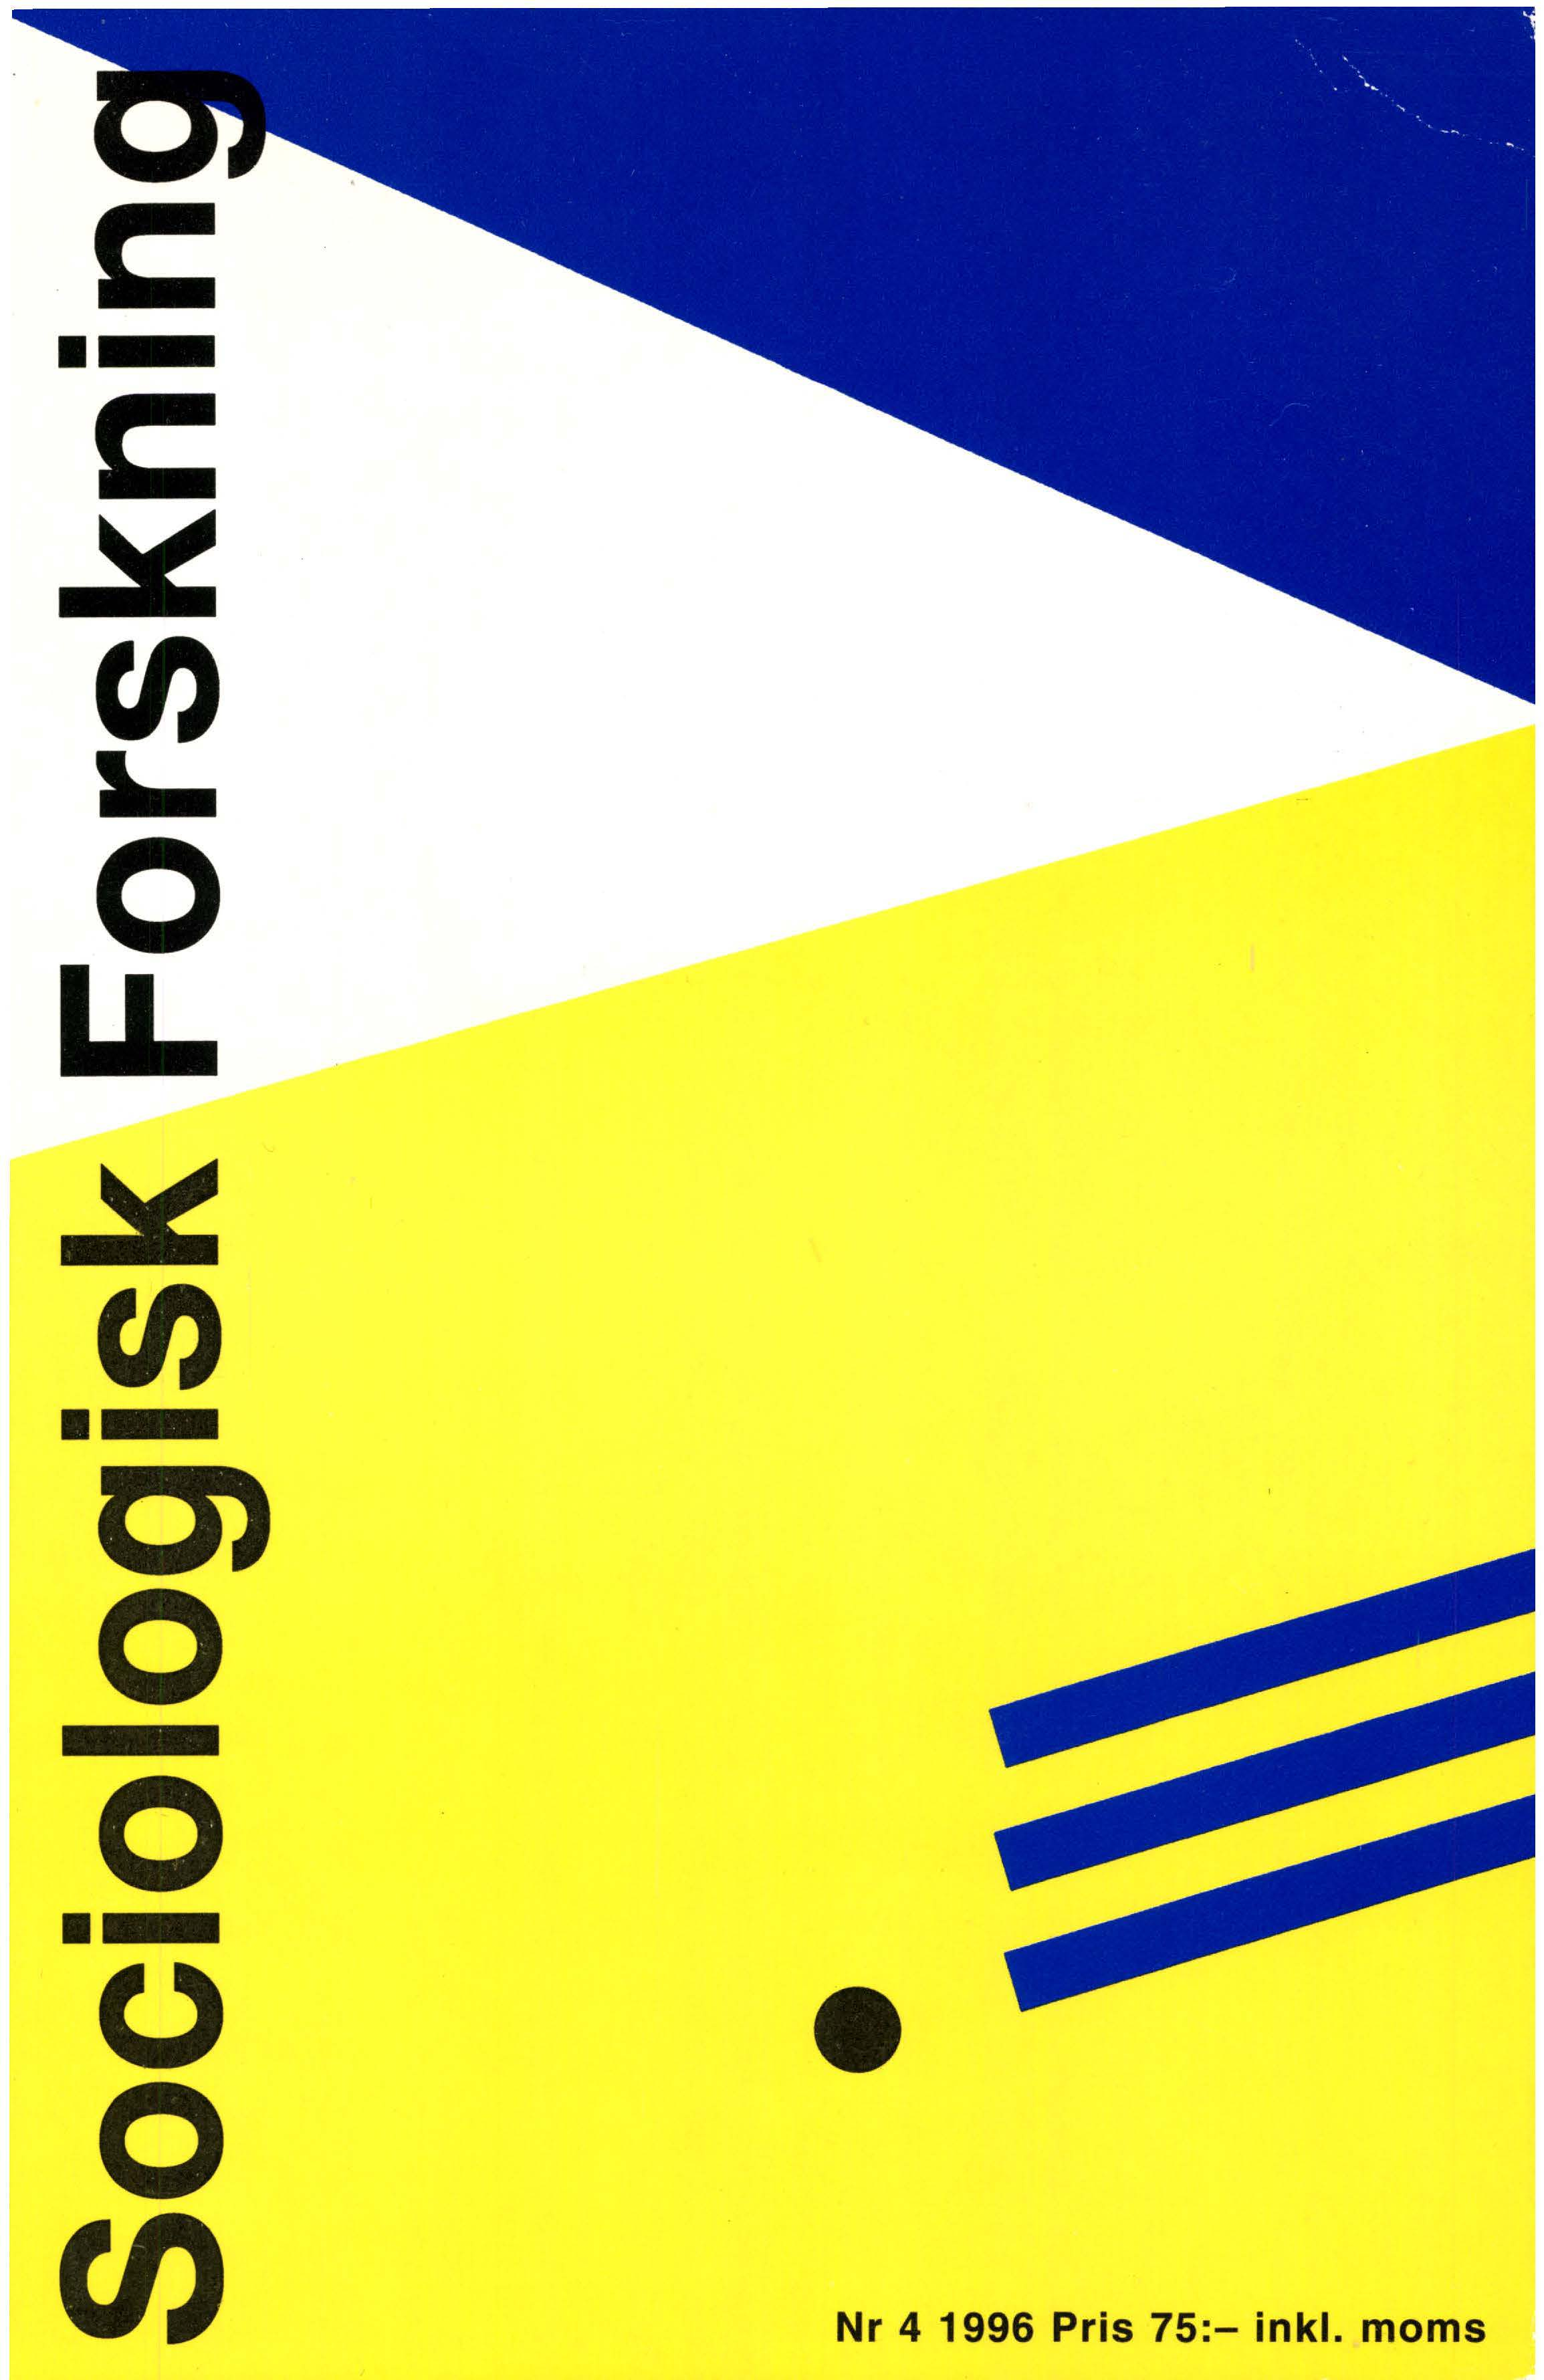 Visa Vol 33 Nr 4 (1996)